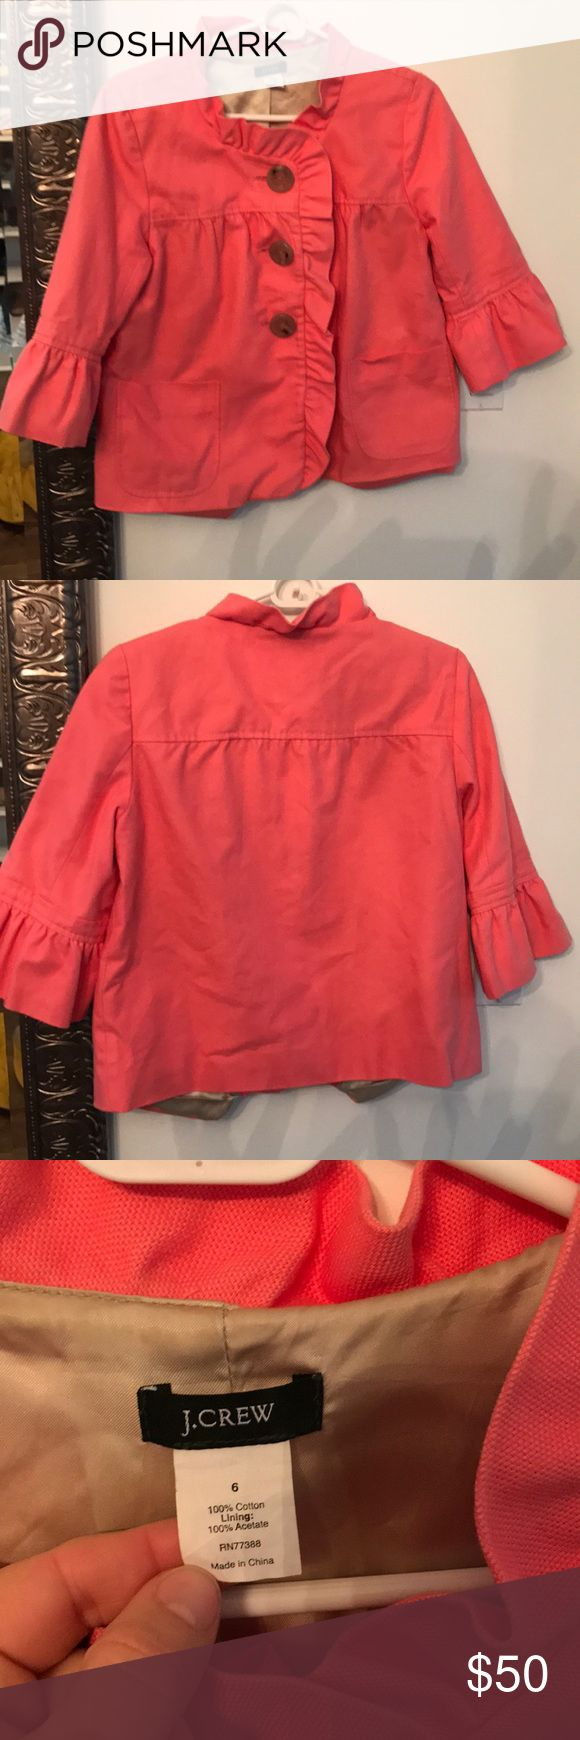 J. Crew coral jacket Jcrew jacket size 6 great condition! Pet free smoke free J. Crew Jackets & Coats Blazers